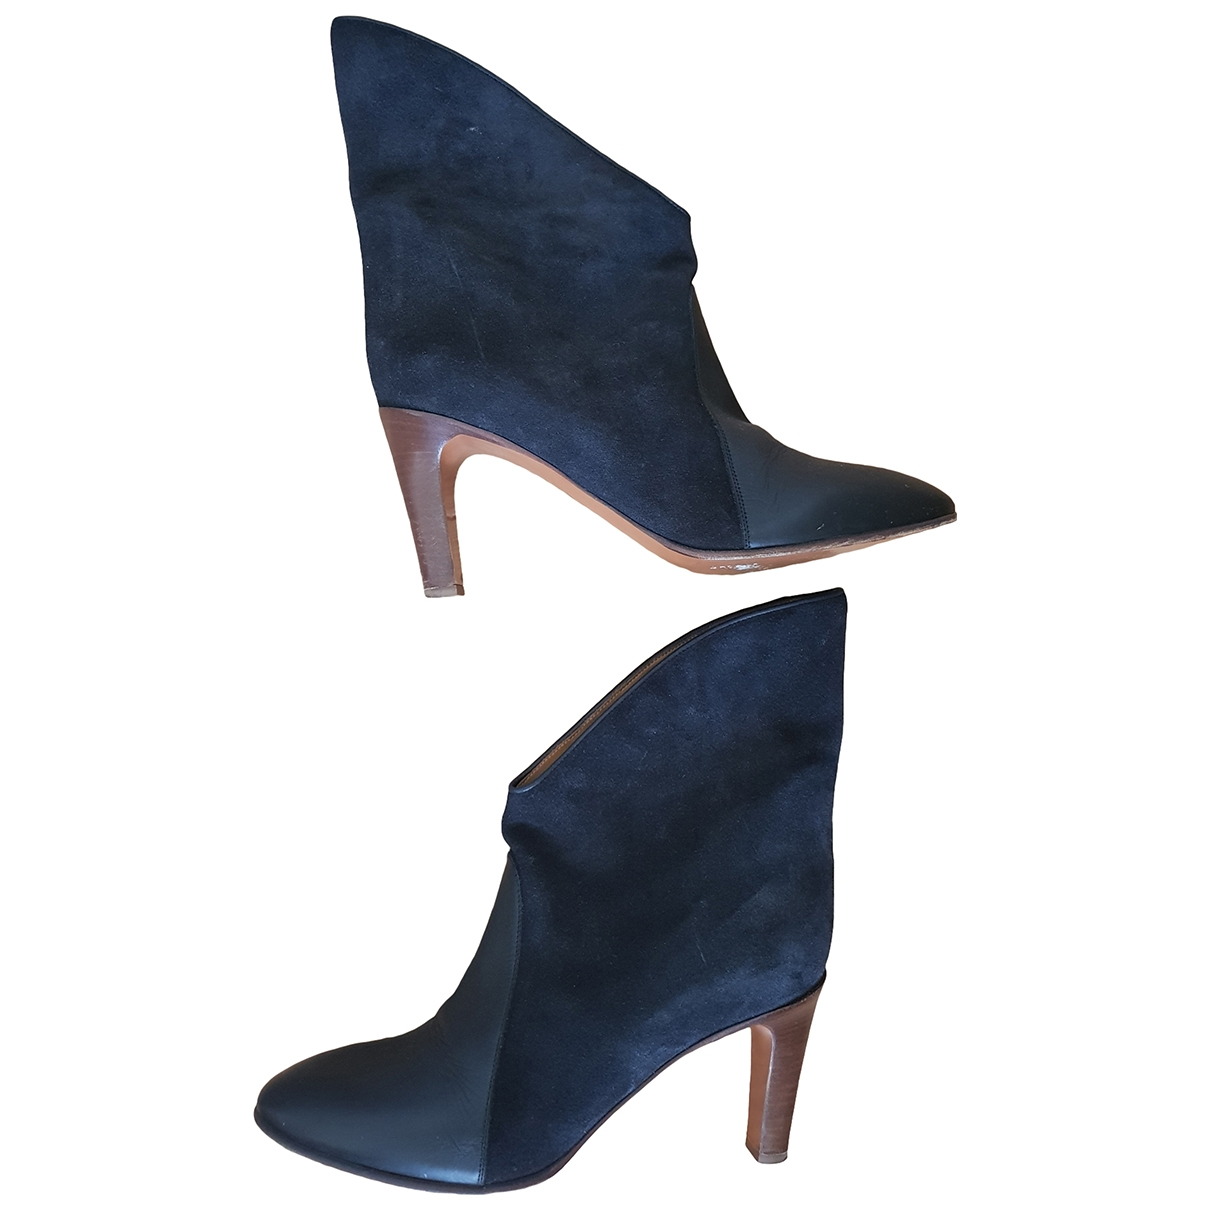 Chloé \N Black Suede Boots for Women 39.5 EU